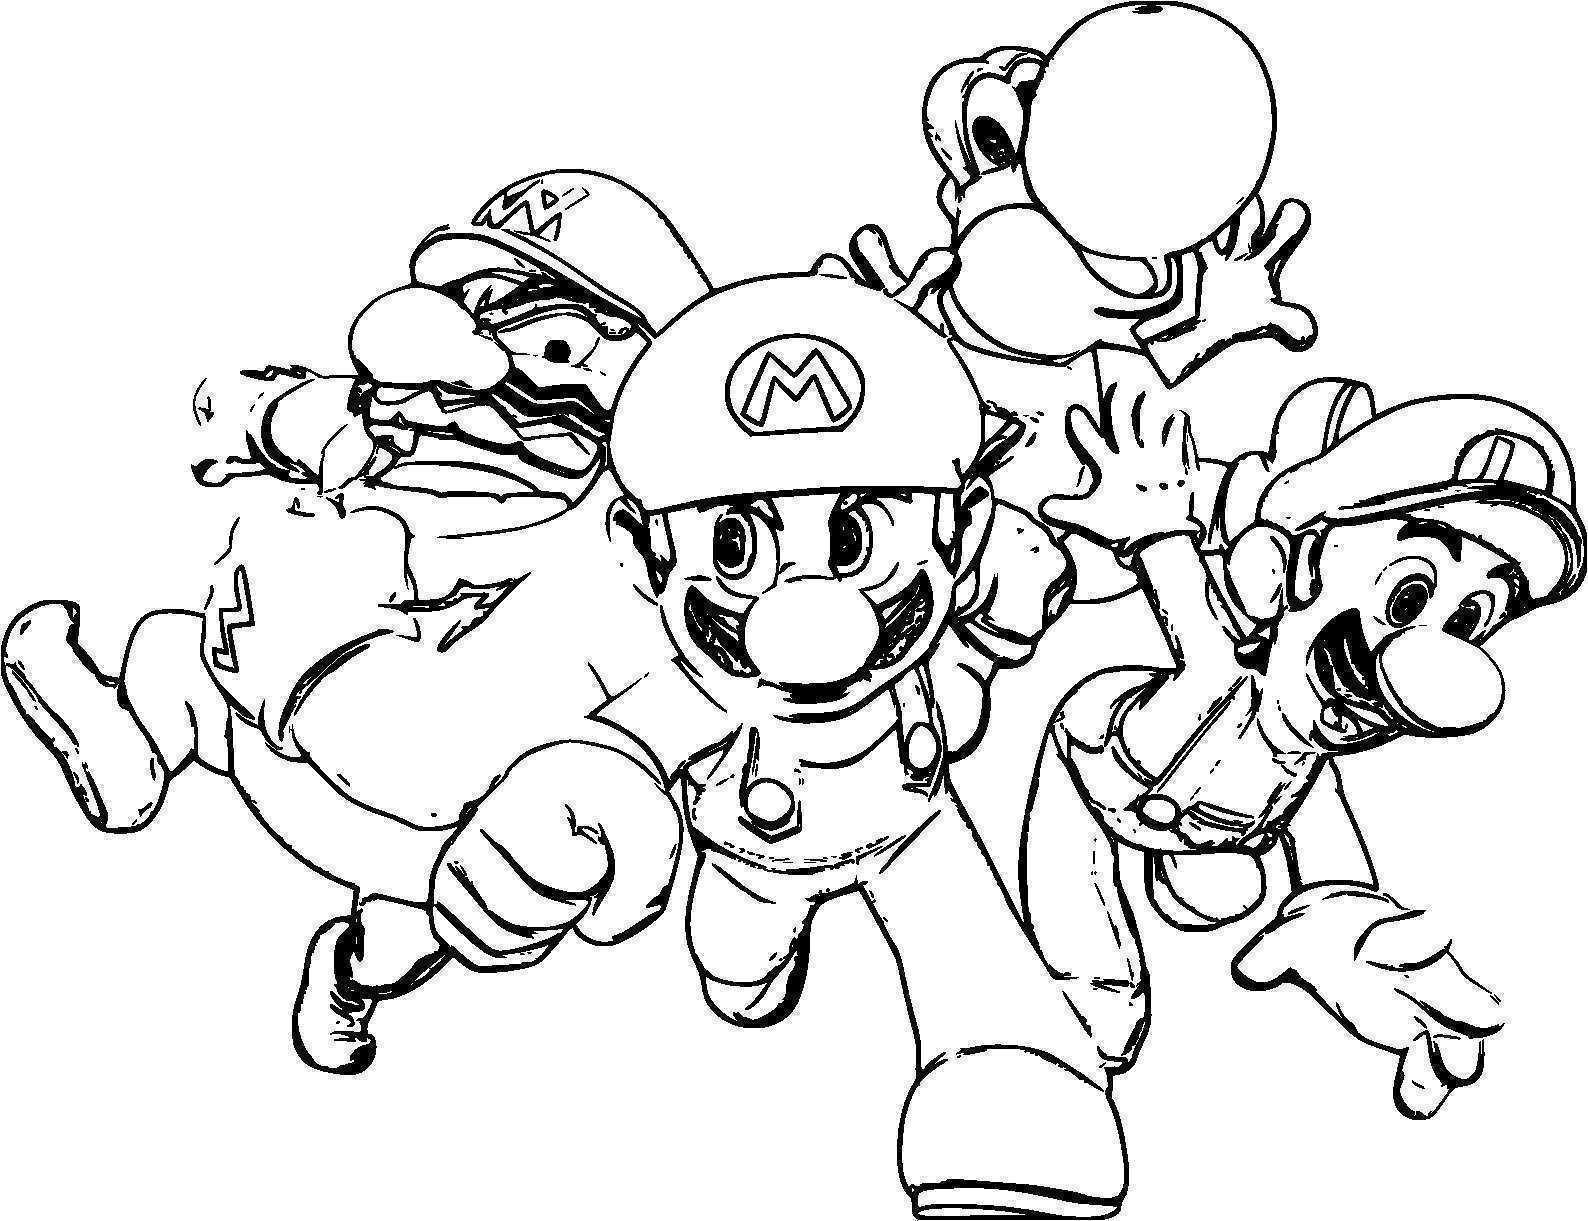 Coloriage Gratuit A Imprimer De Mario Coloriage Imprimer